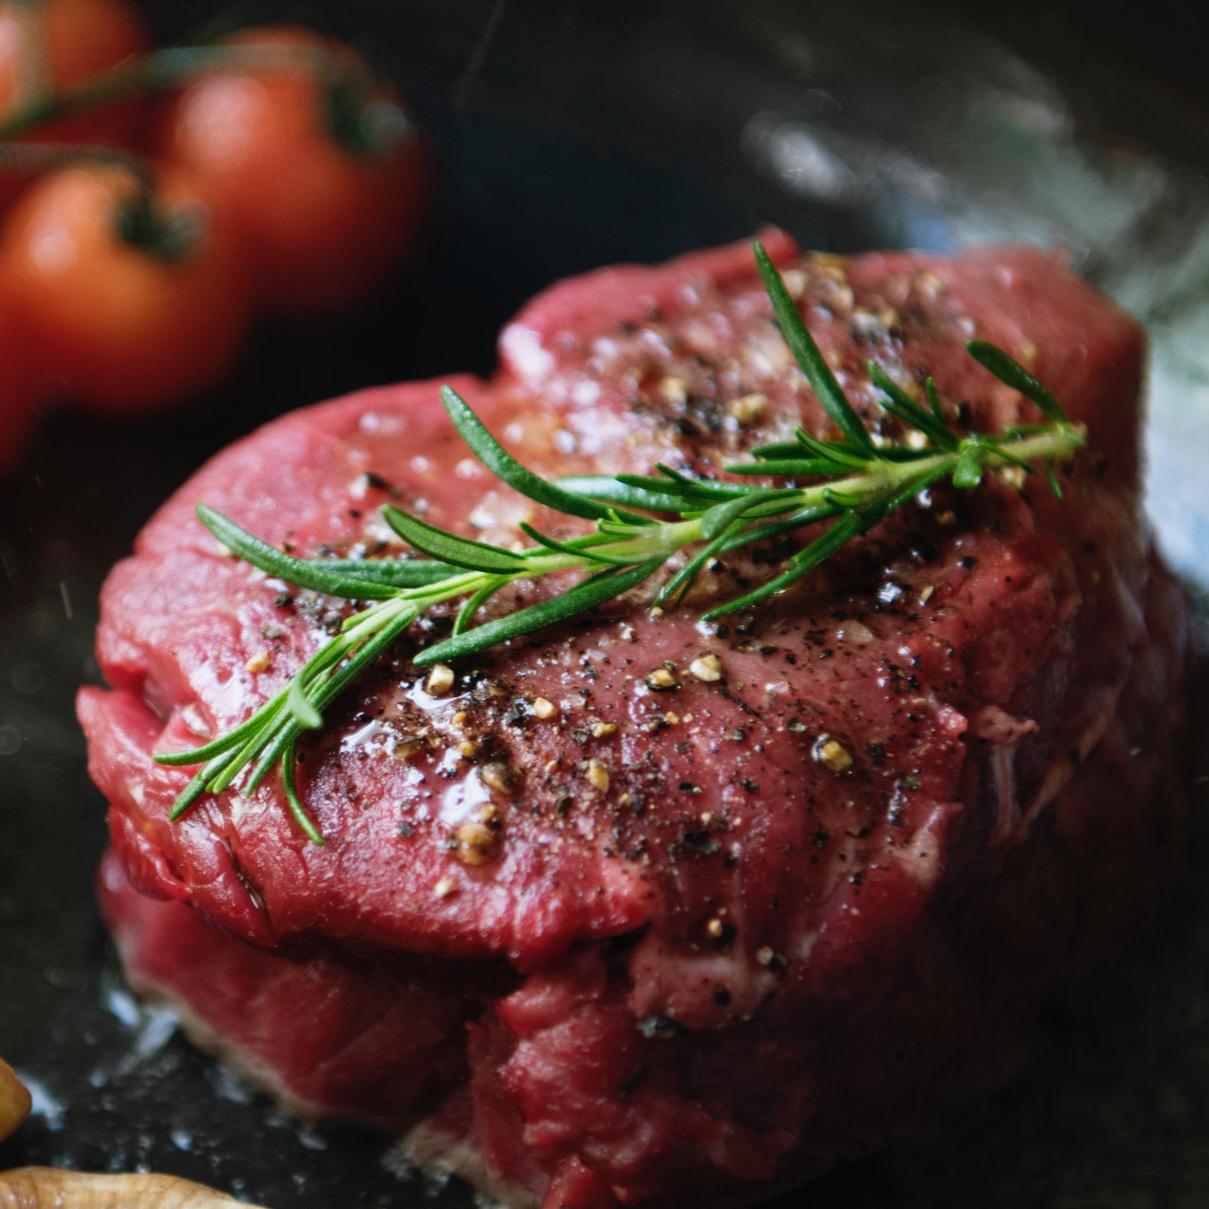 cooking-a-fillet-steak-food-photography-recipe-JBW4S86.jpg